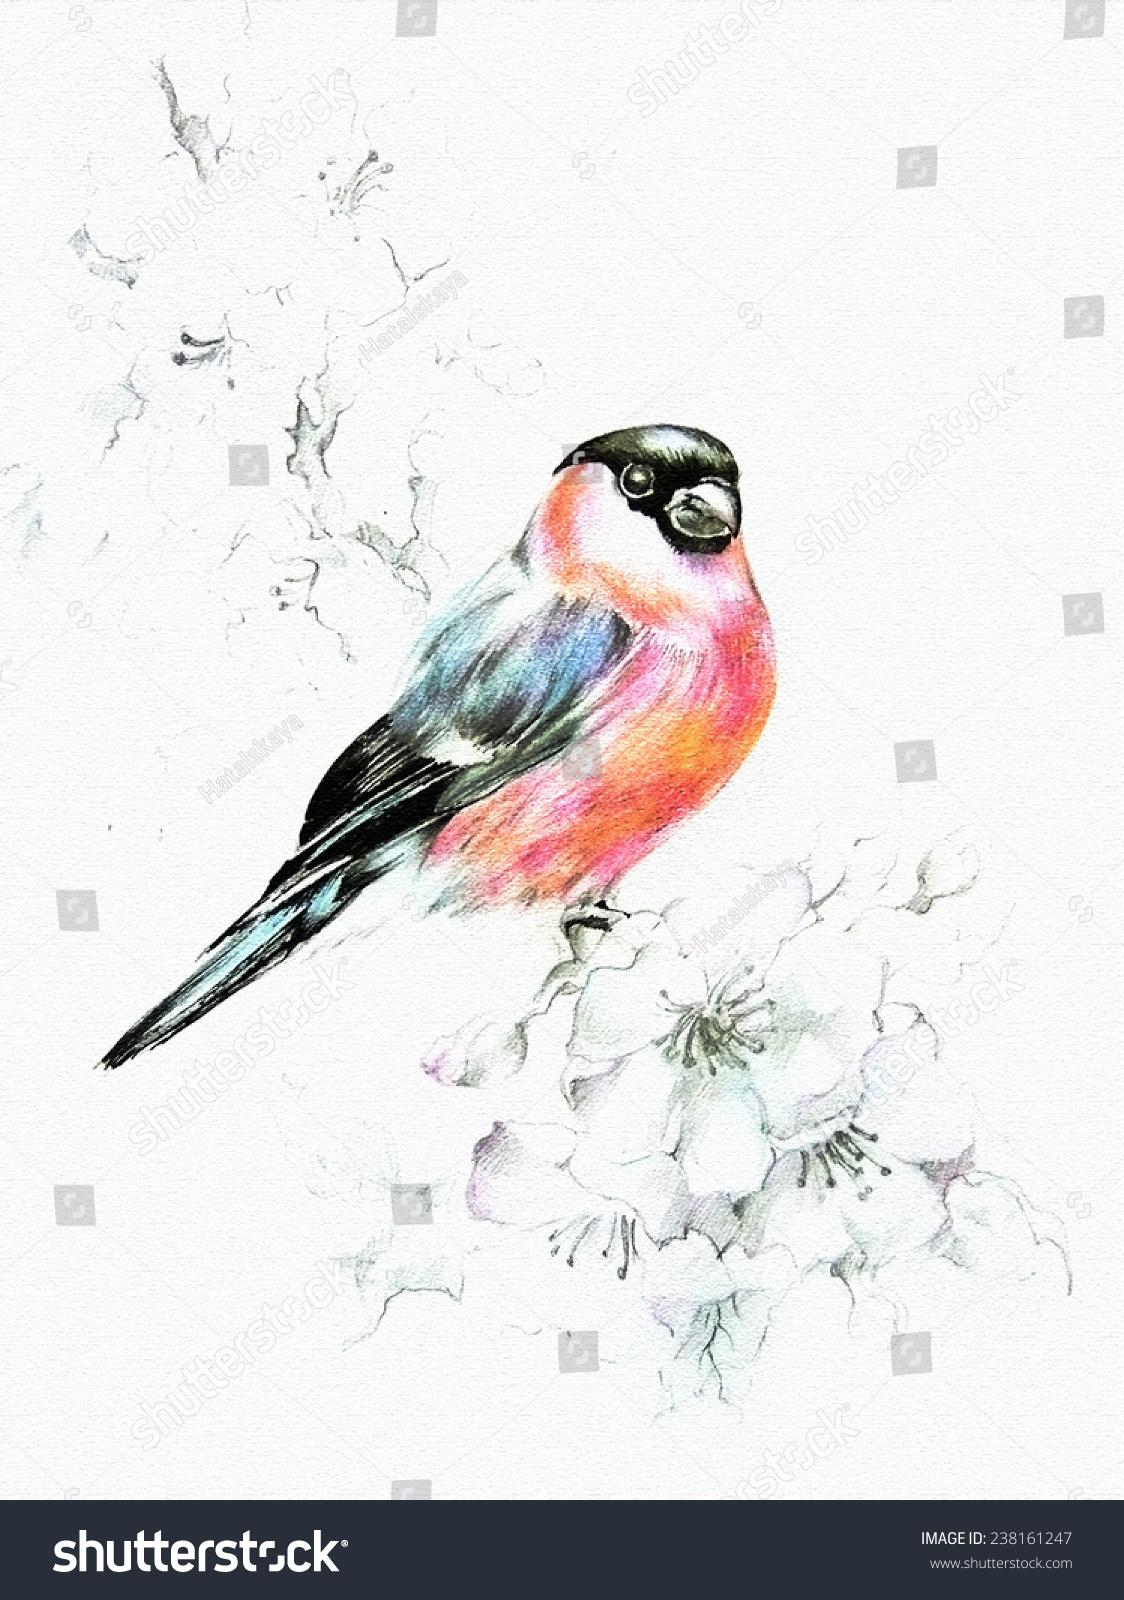 Where bullfinch fly in spring